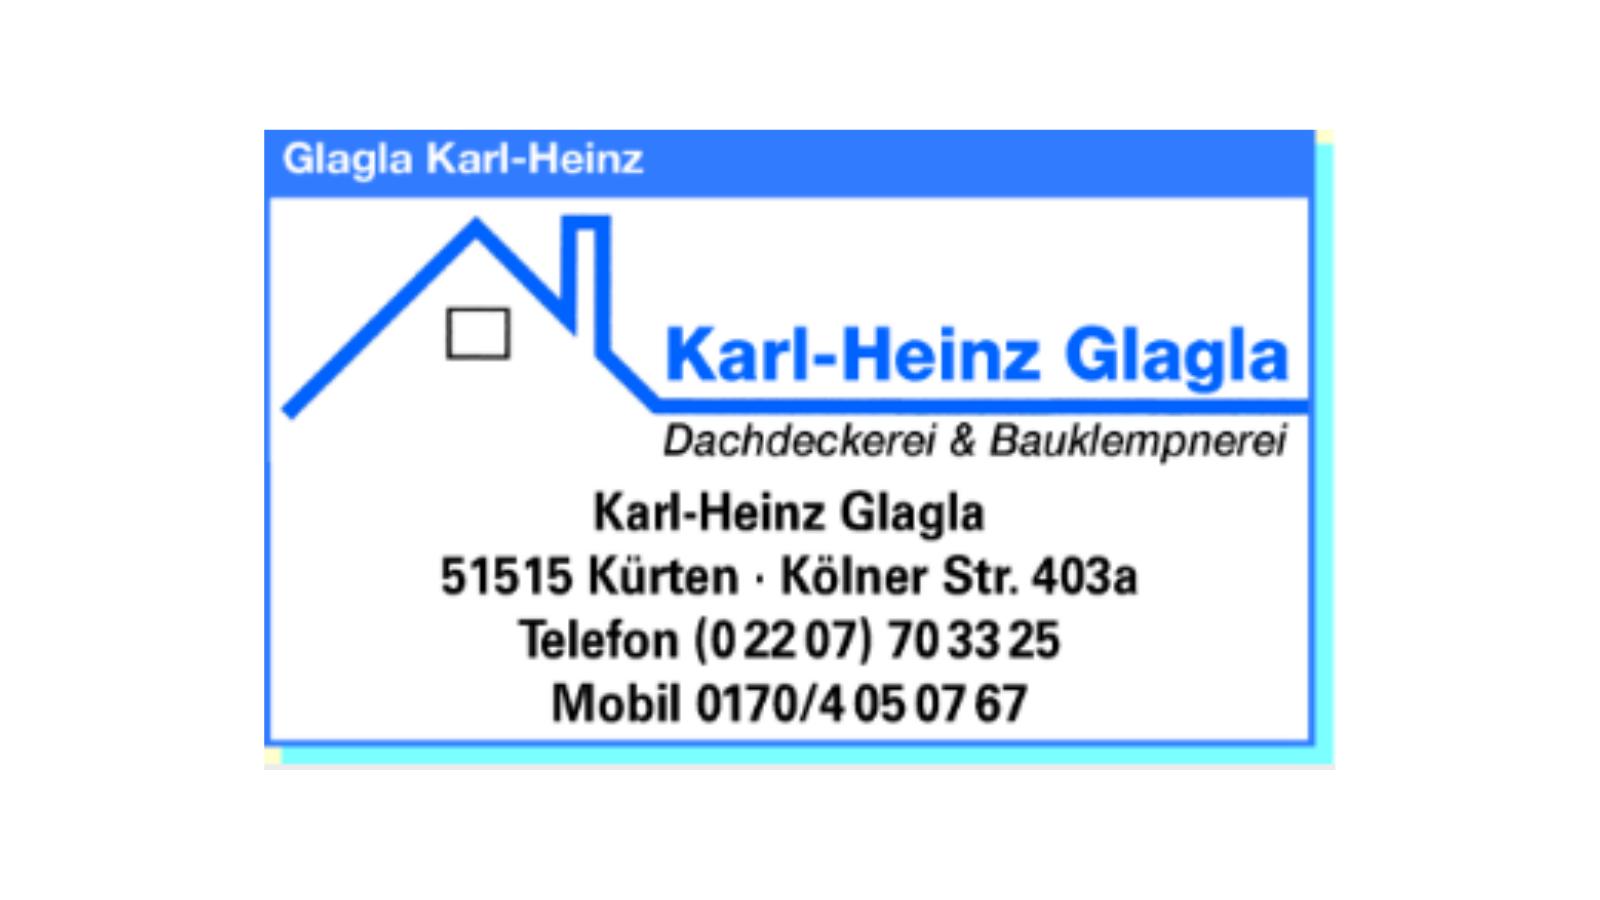 Karl-Heinz Glagla Dachdeckerei & Bauklempnerei